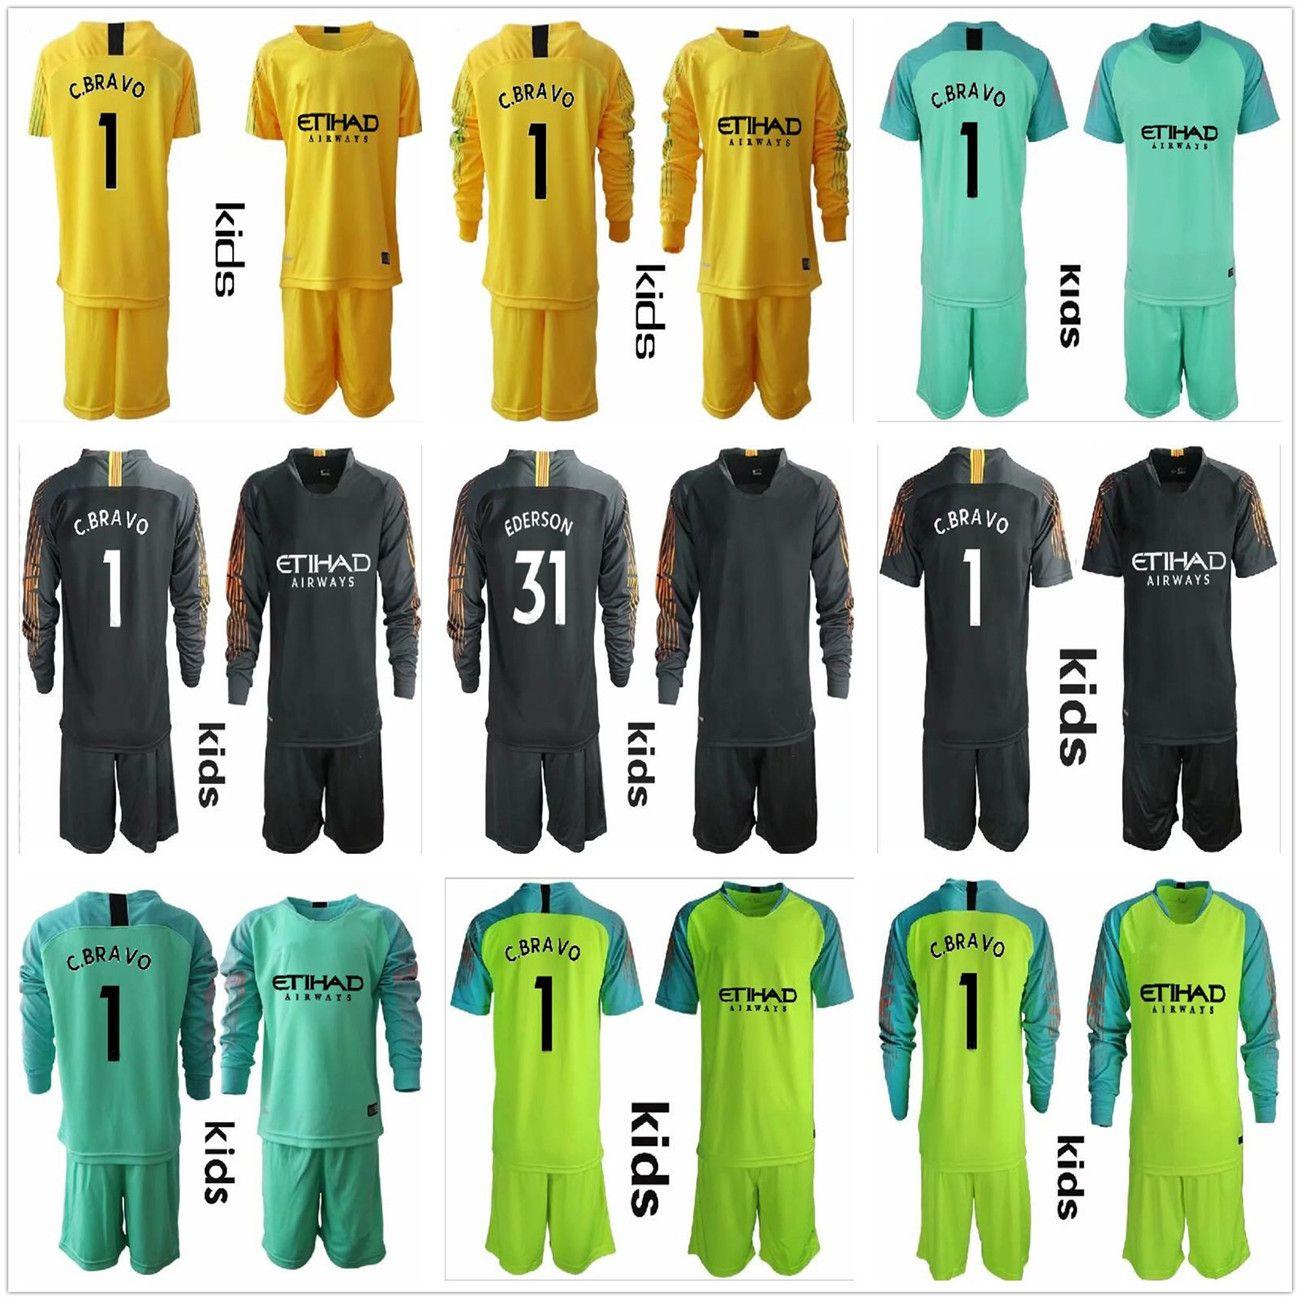 5766e8fbe 2019 2018 2019 Long Kids City Goalkeeper Jerseys Youth Claudio Bravo  Goalkeeper Jersey C. Bravo  31 Ederson Child Goalkeeper Soccer Sets Uniform  From ...